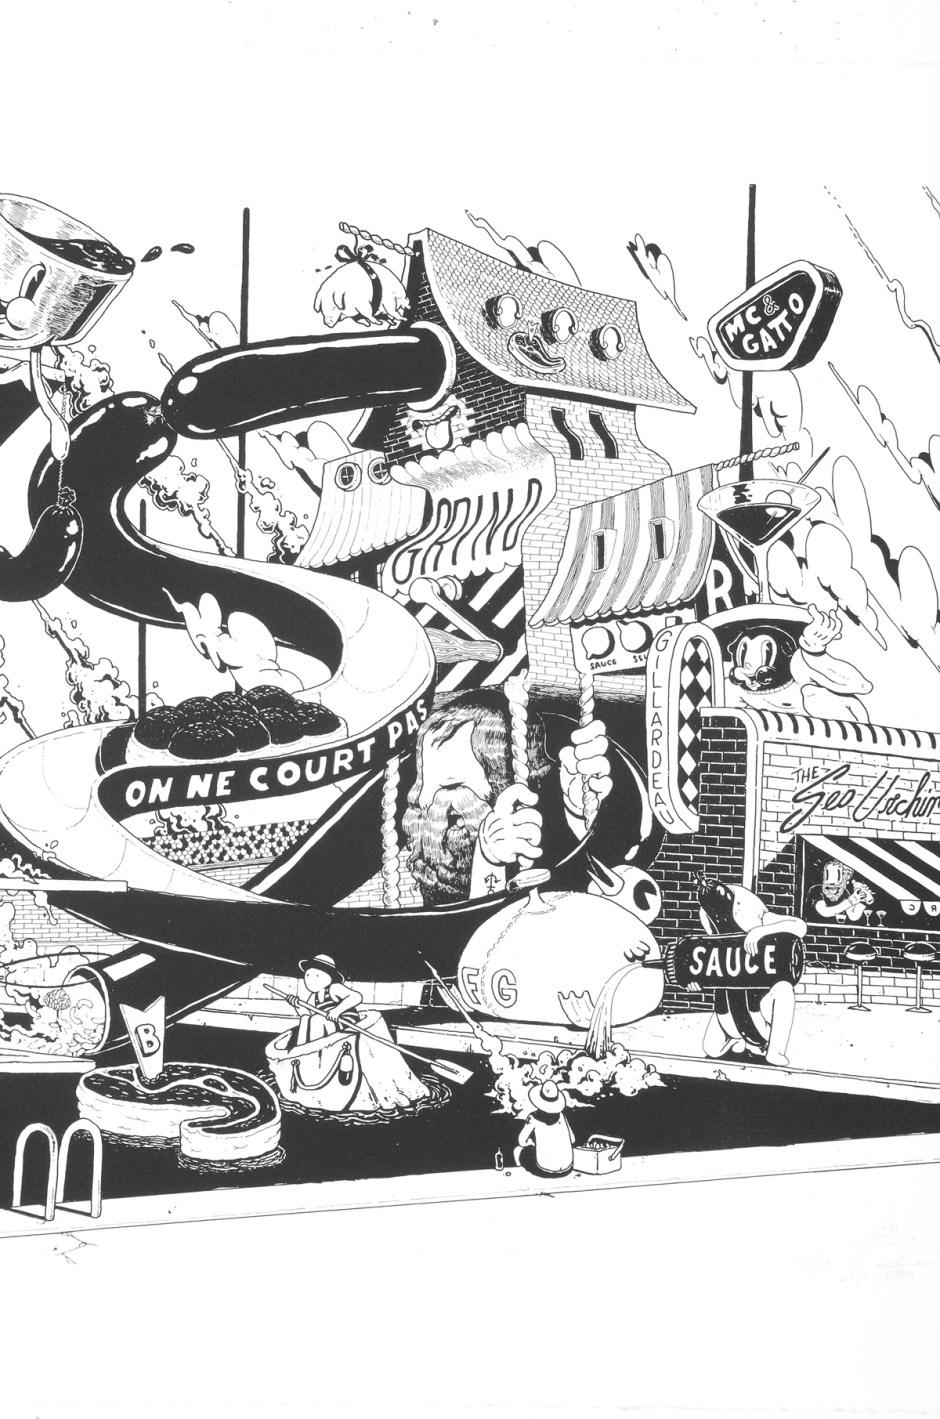 ugo-gattoni-mcbess-sweetbread-lithography-oeuvre-illustration-fine-art-print-collaboration-edition-soldart-61-detail-piscine-bouffe-architecture-design